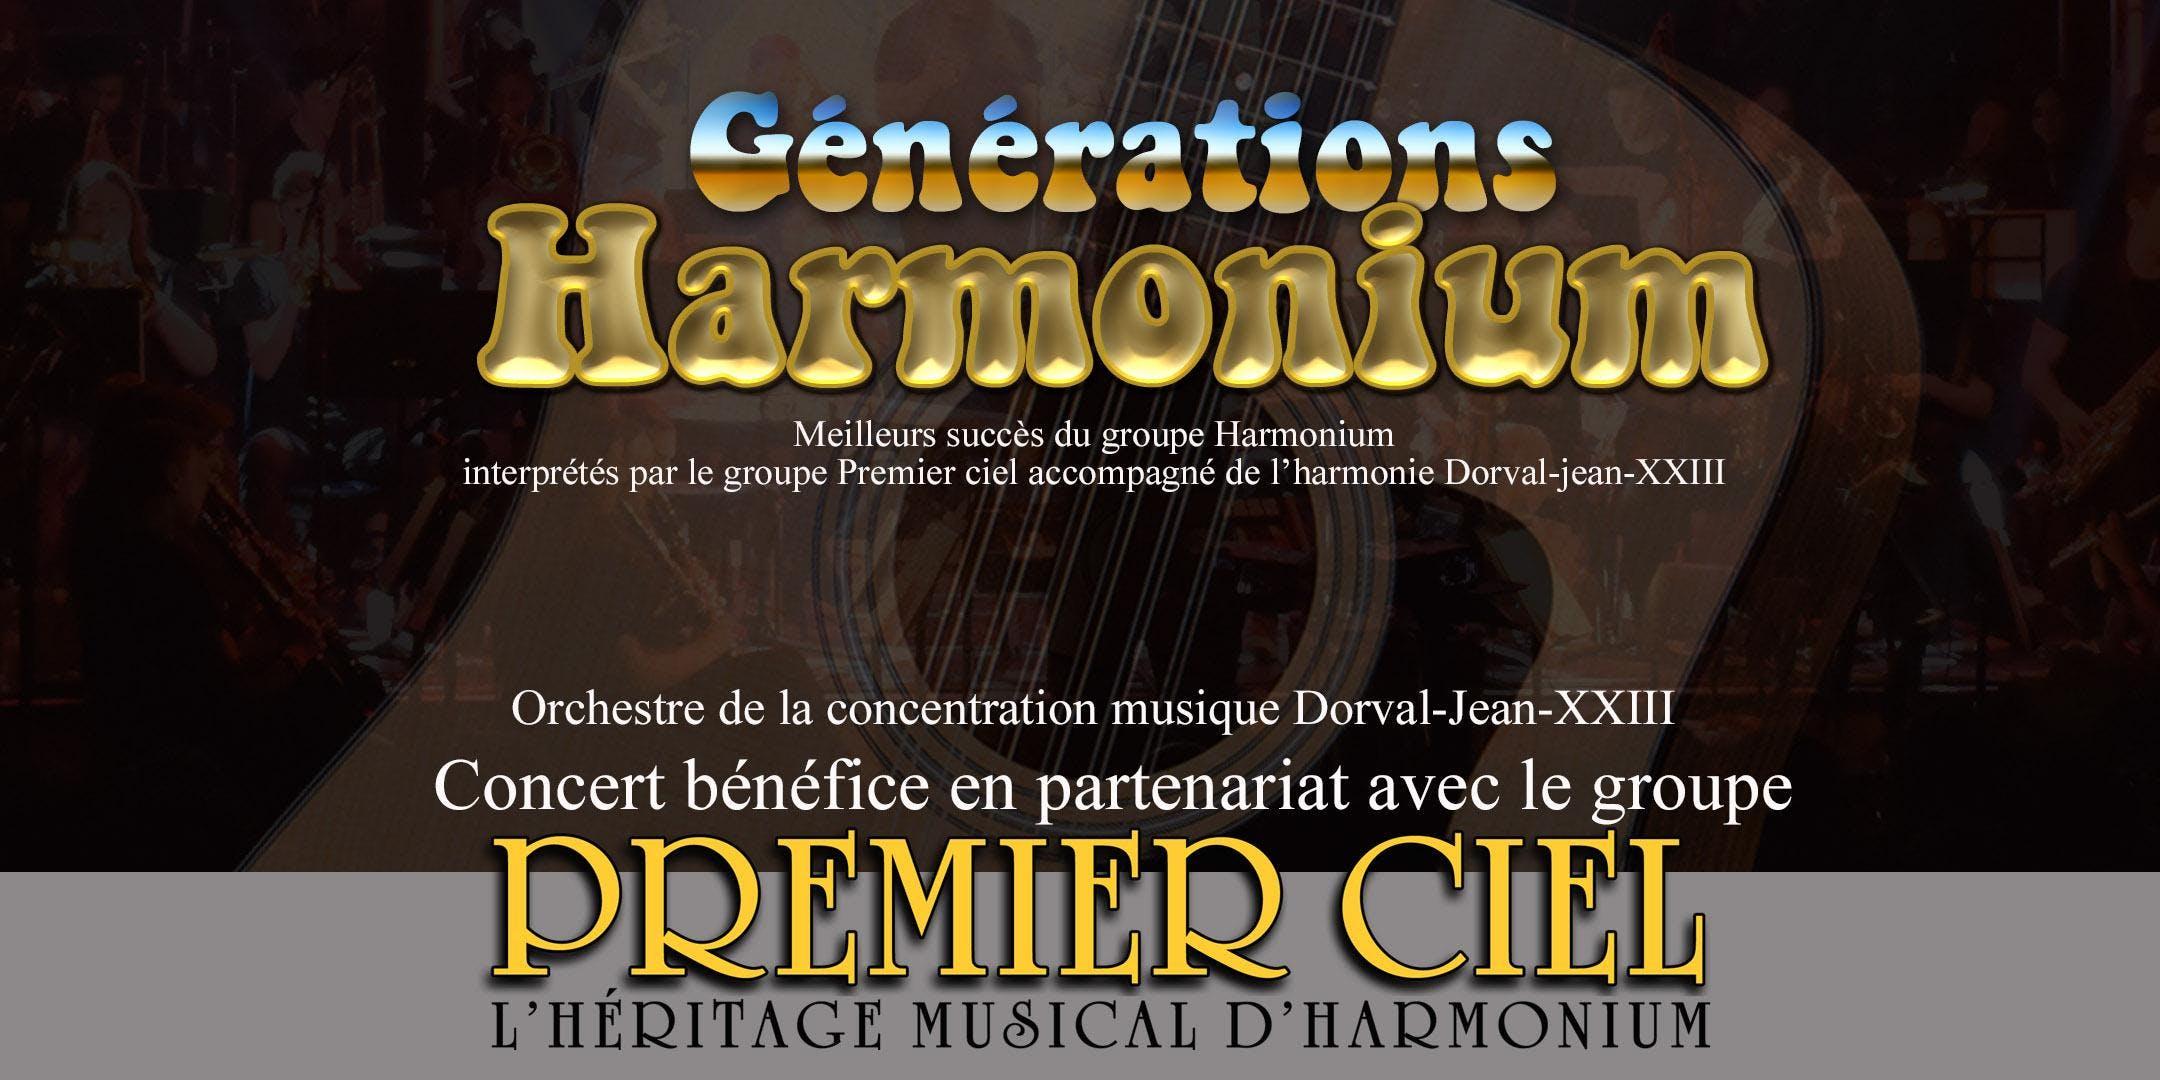 Générations Harmonium